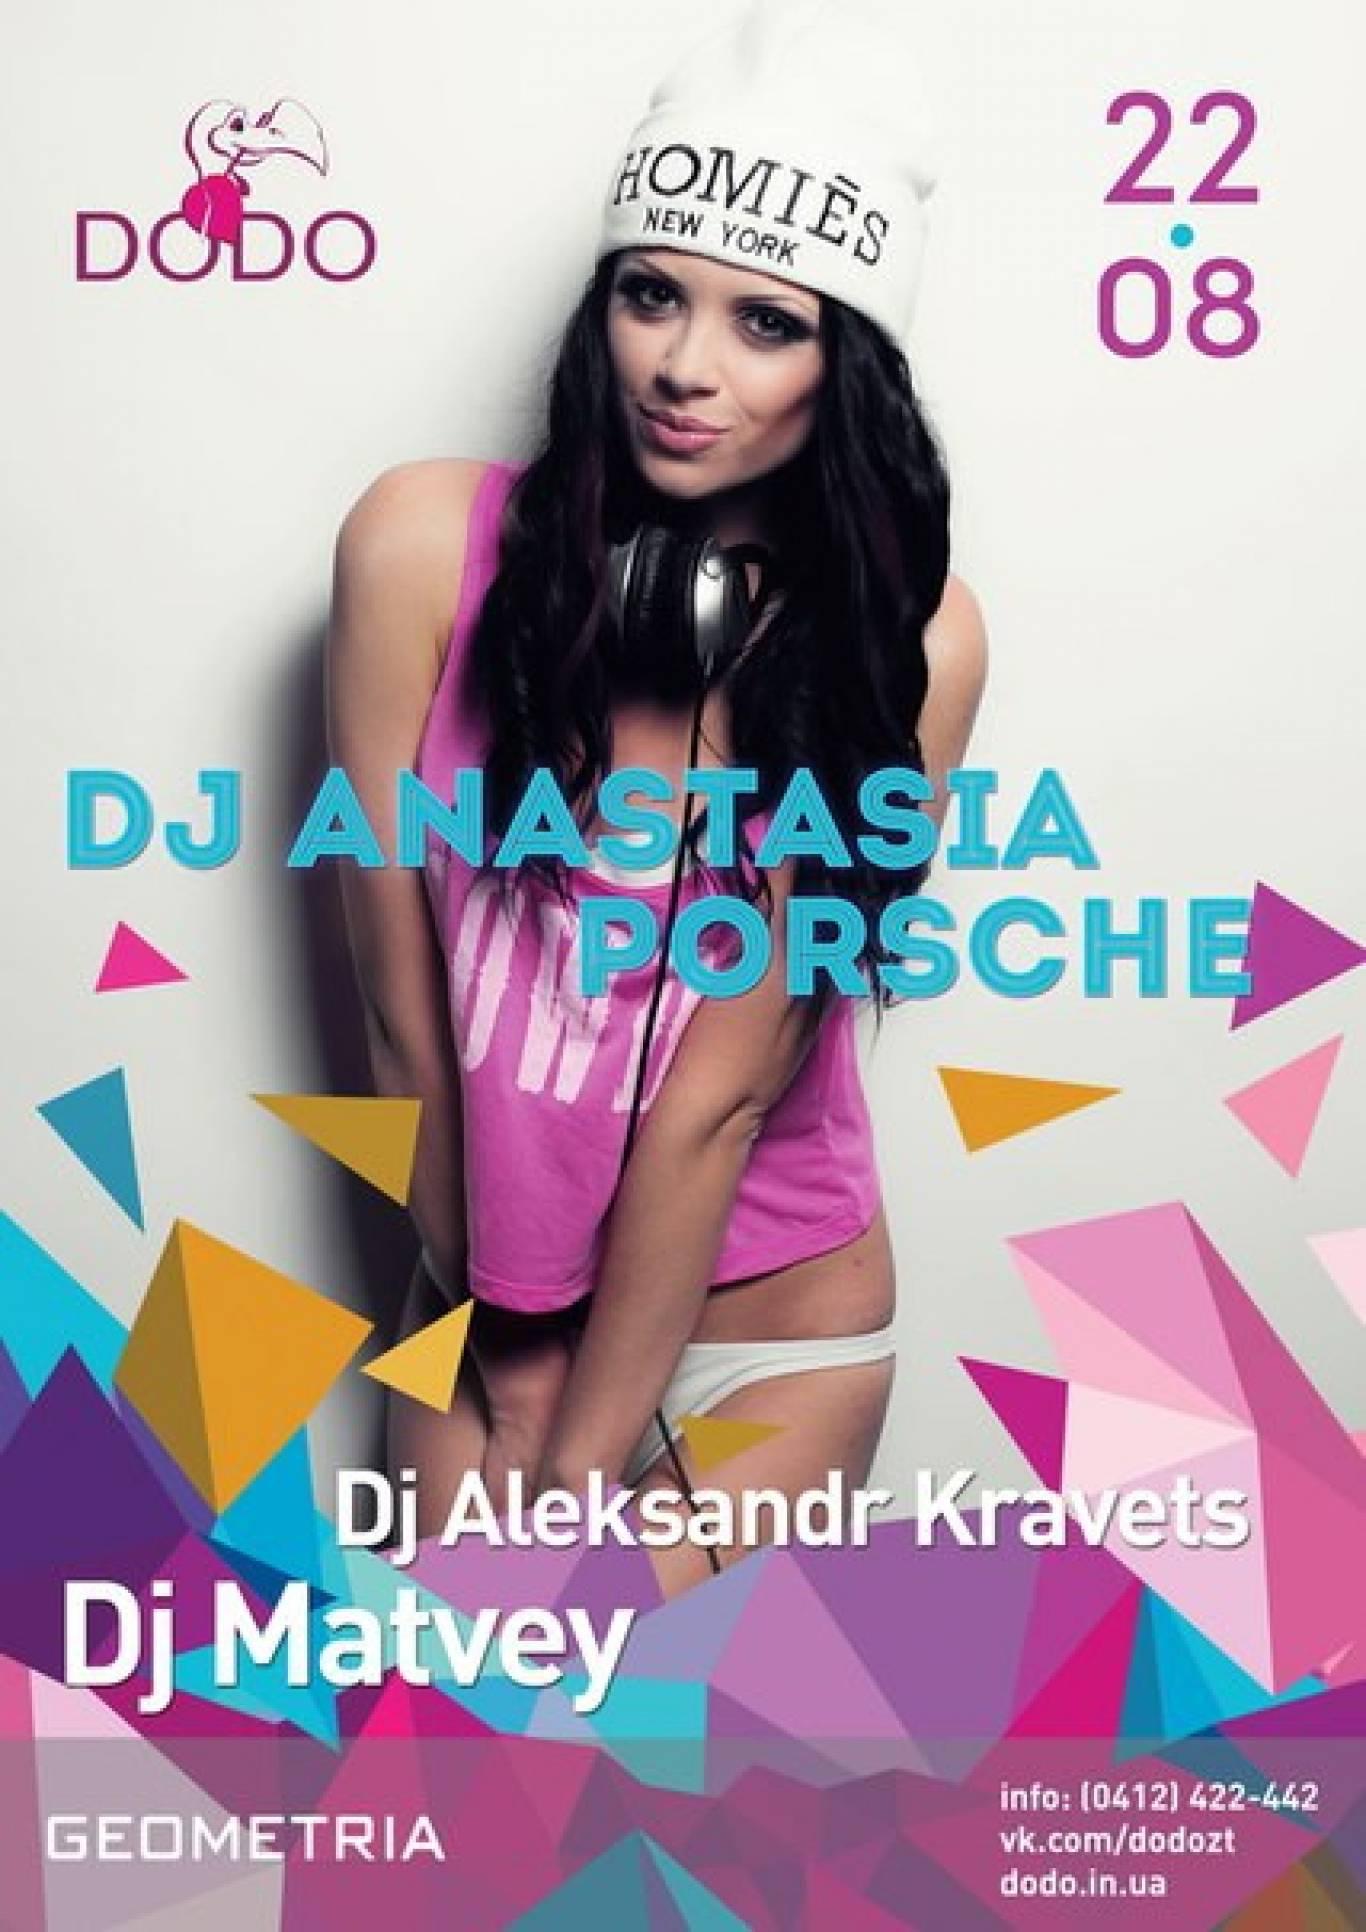 DJ ANASTASIA PORSCHE (ночной клуб DODO)